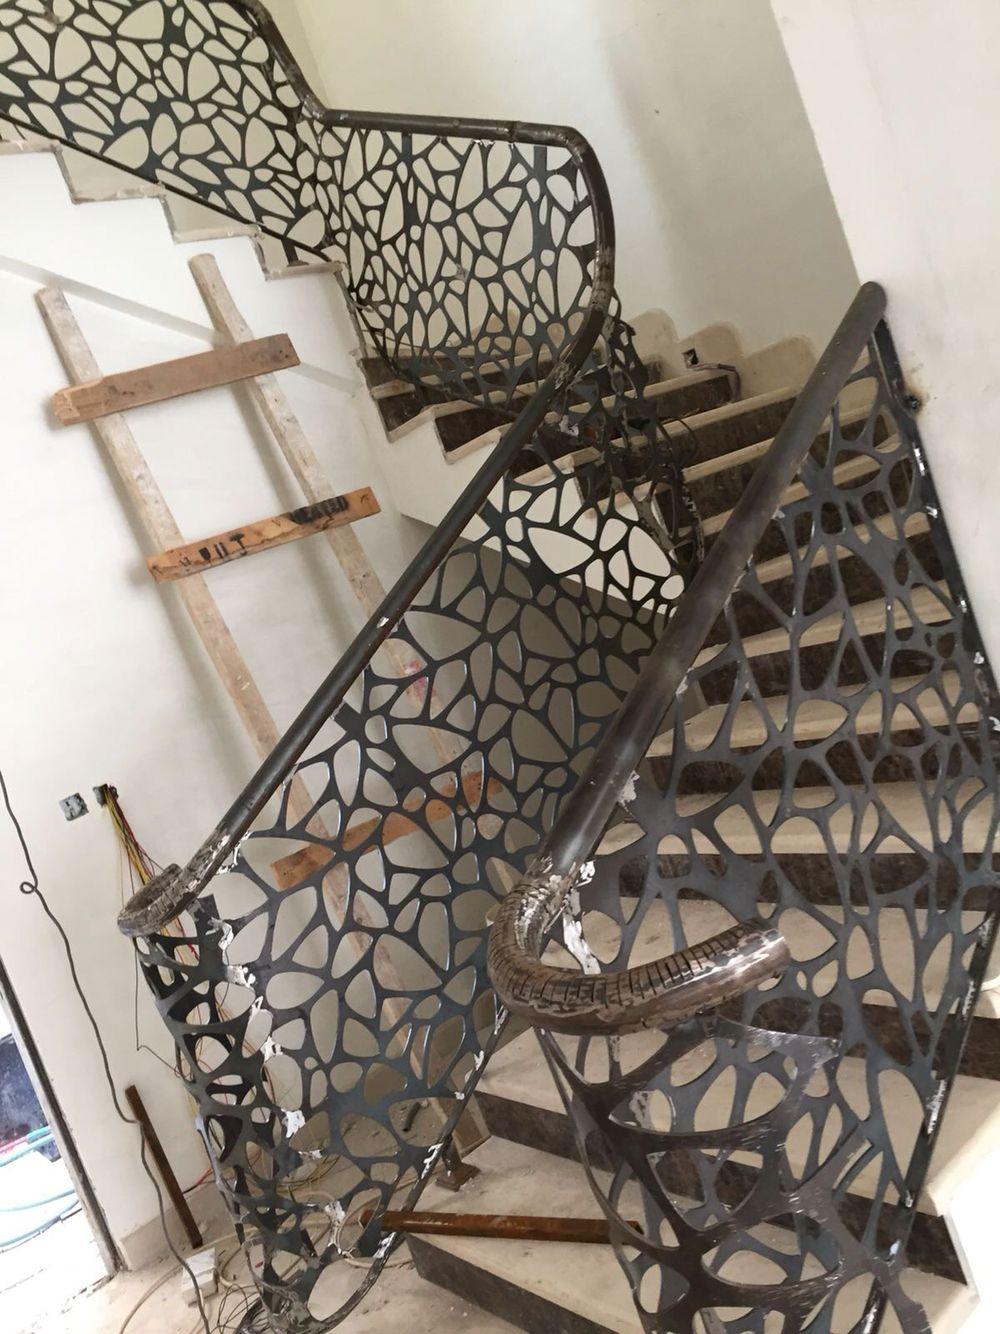 #laser#metal#amazing#saudiarabia#railings#stairs ...